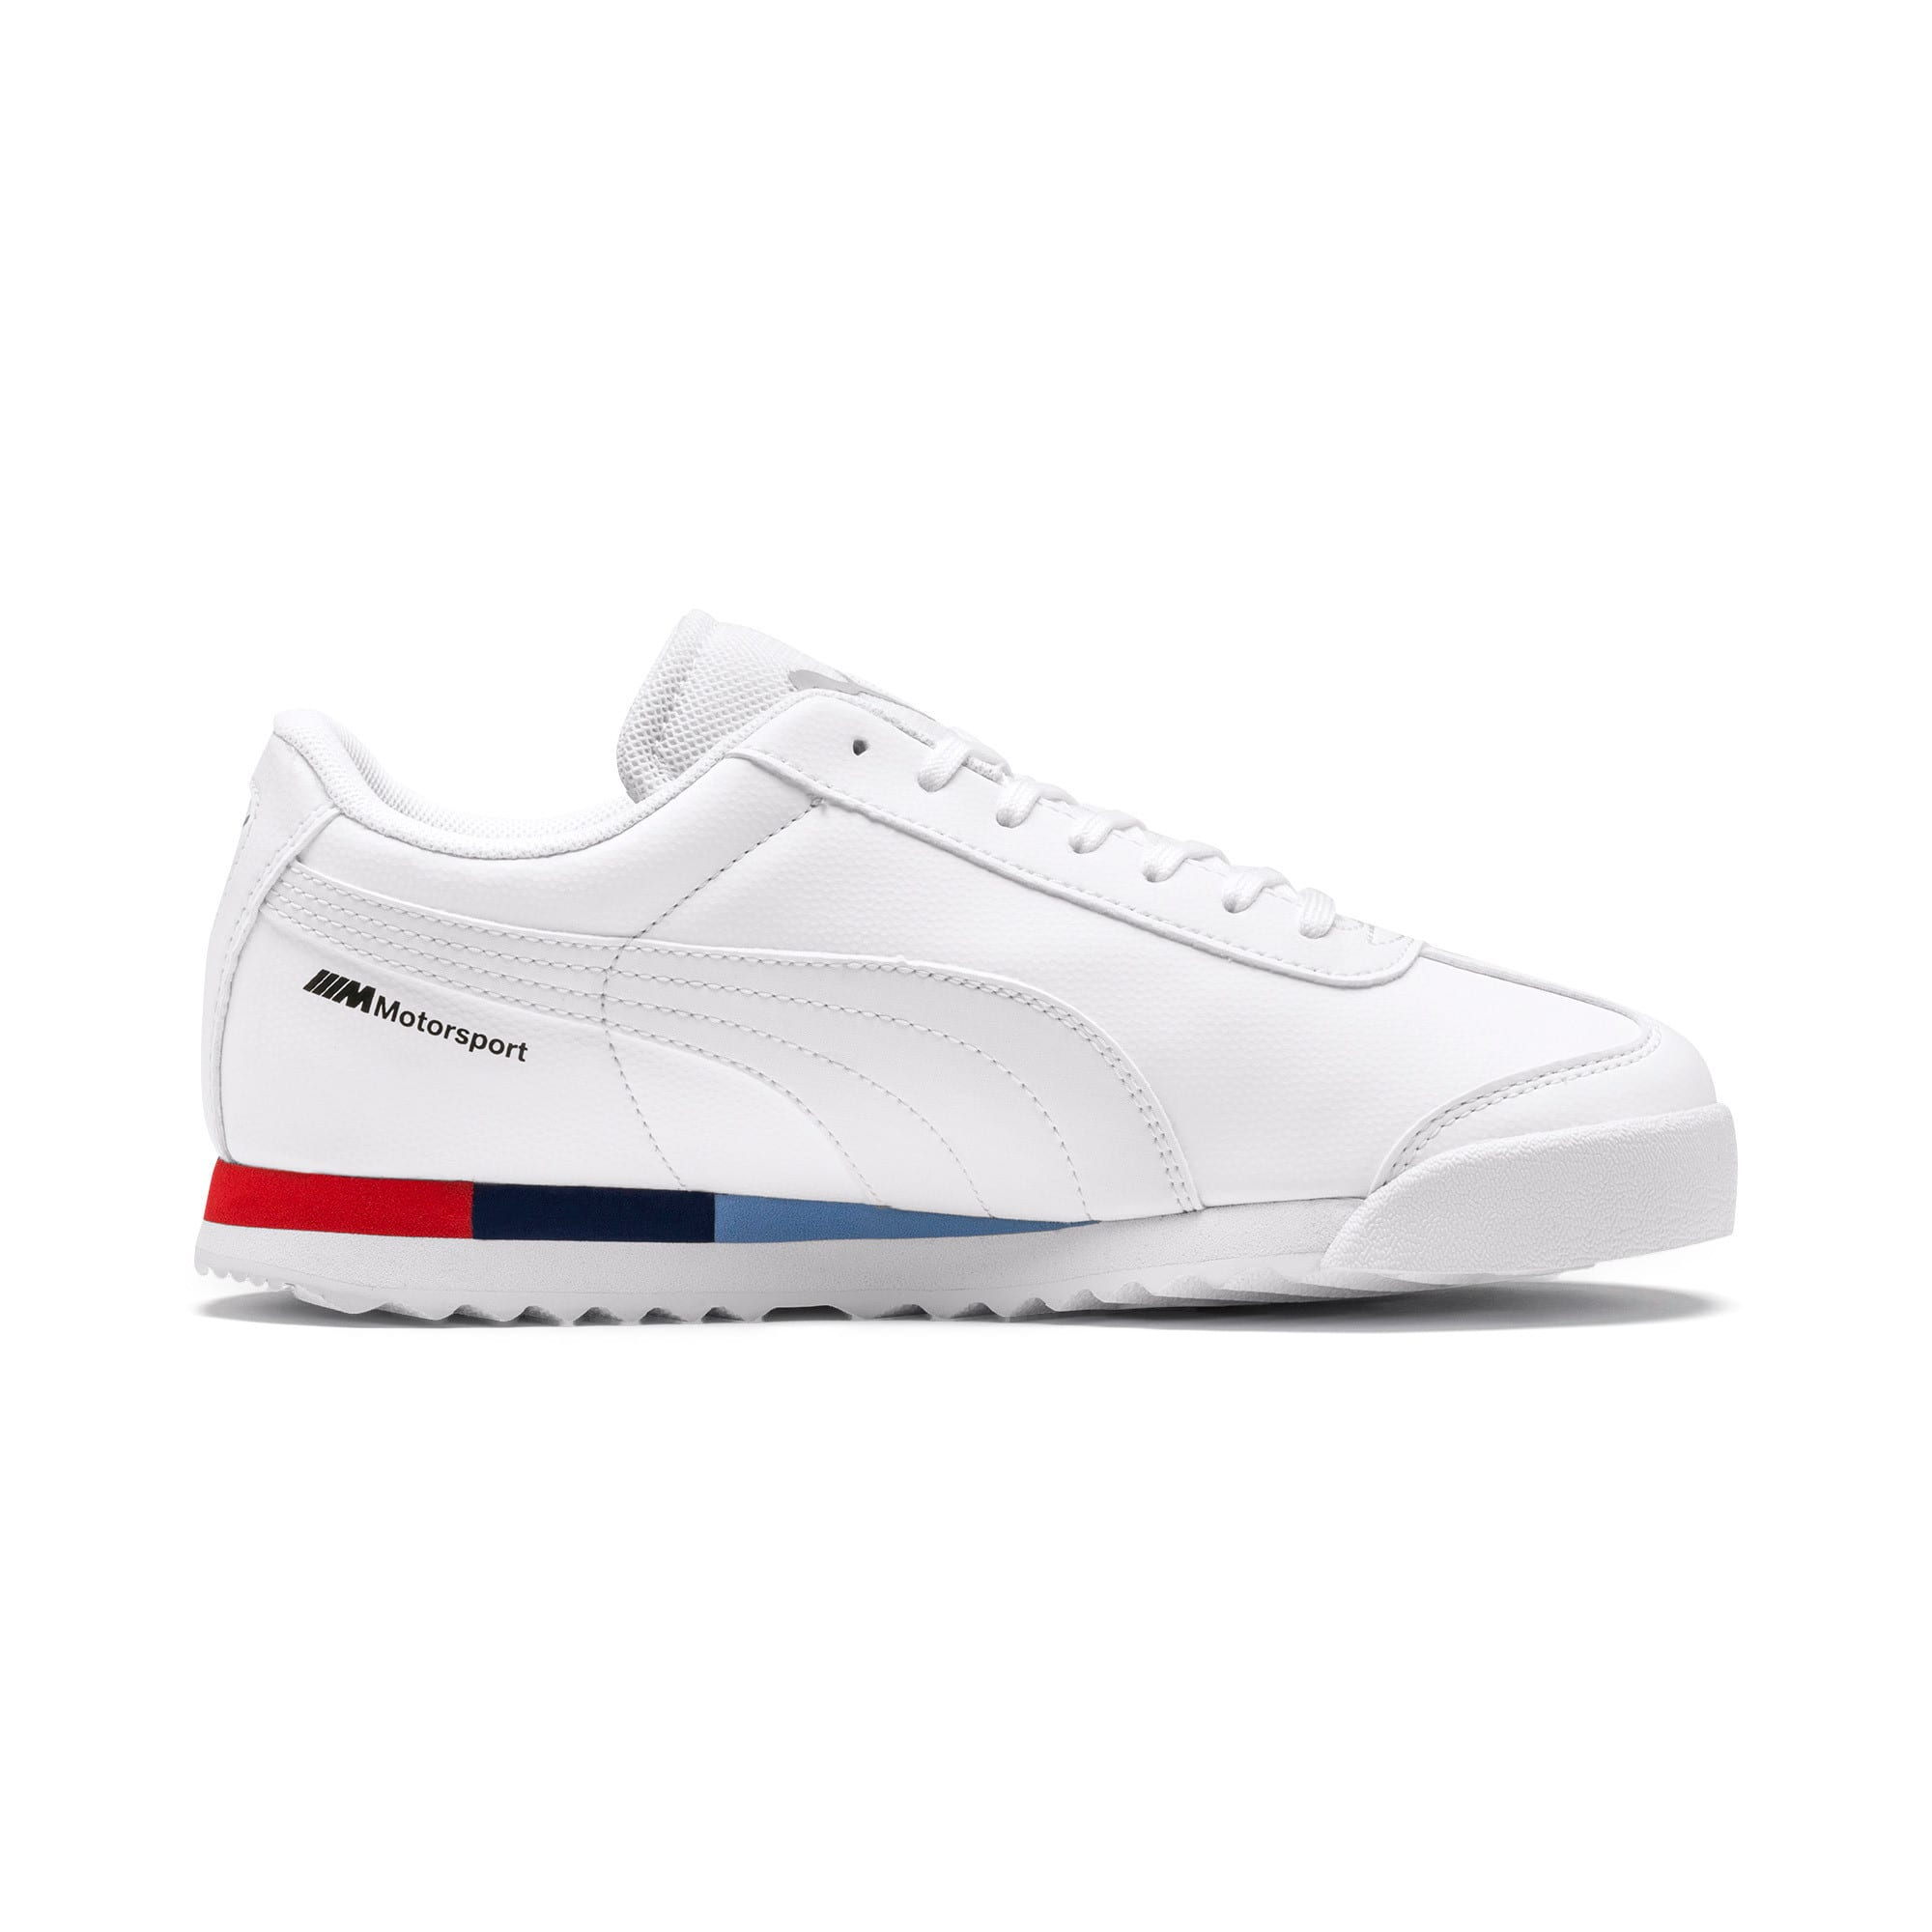 Thumbnail 5 of BMW M Motorsport Roma Sneakers JR, Puma White-Puma White, medium